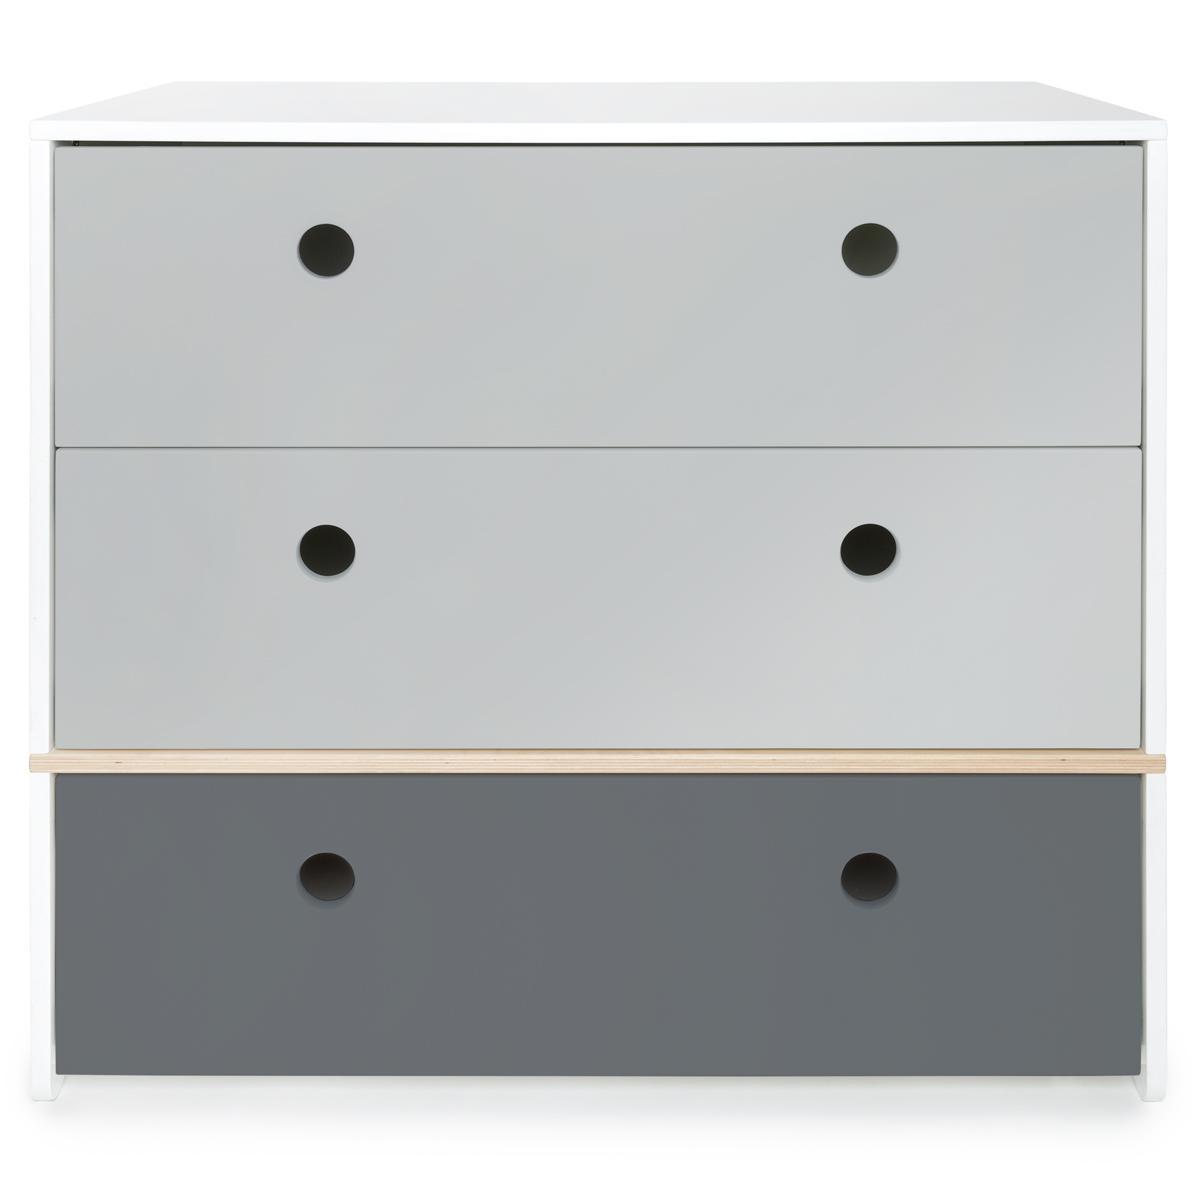 Kommode COLORFLEX Schubladen Farben pearl grey-pearl grey-space grey